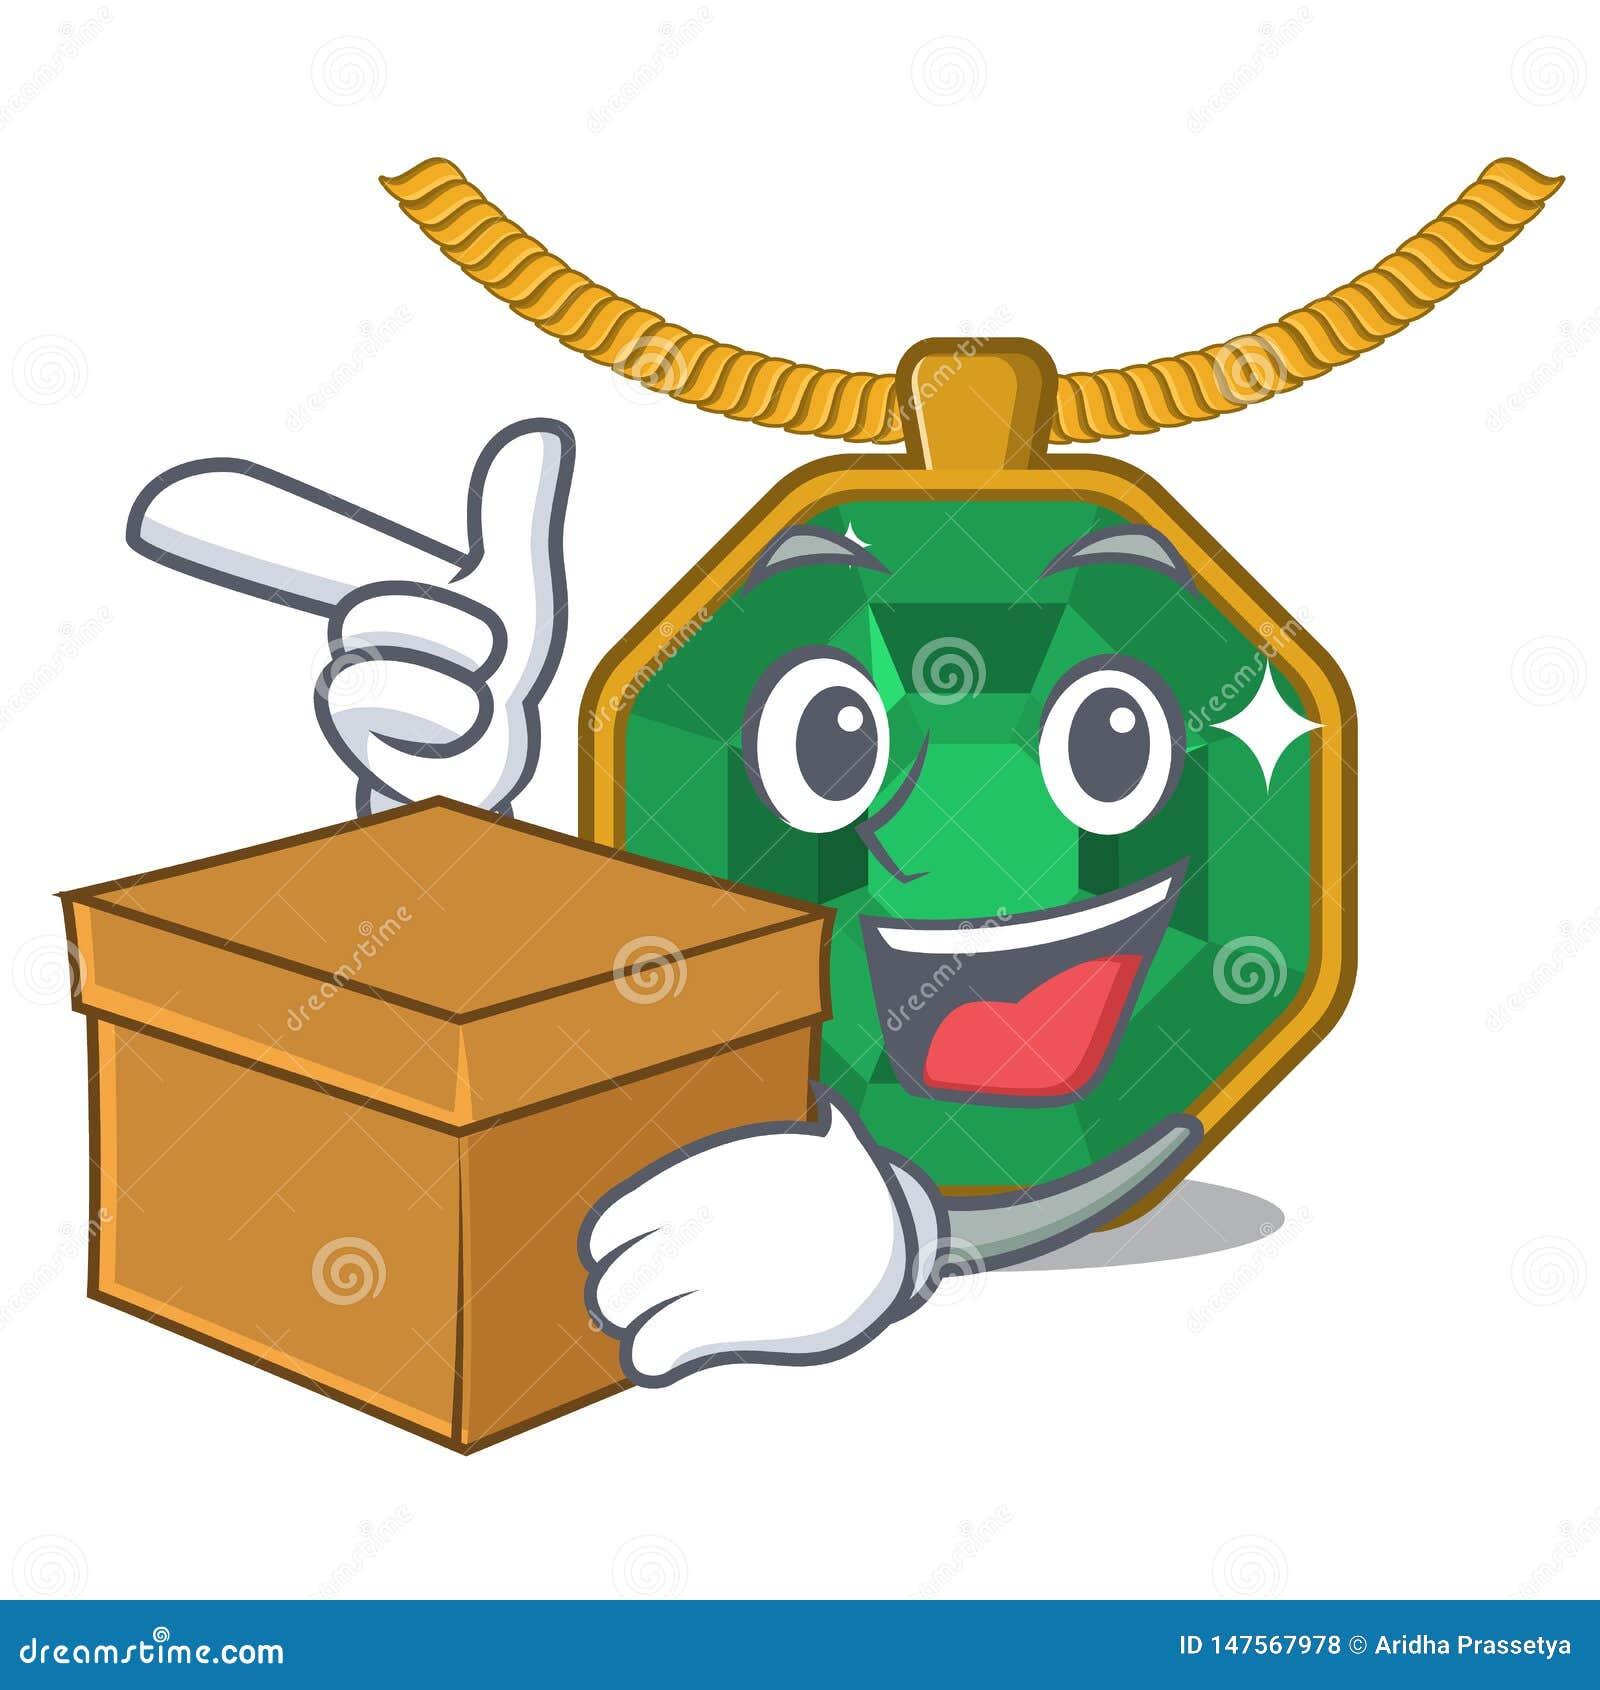 With Box Peridot Jewelry In A Cartoon Box Stock Vector ...